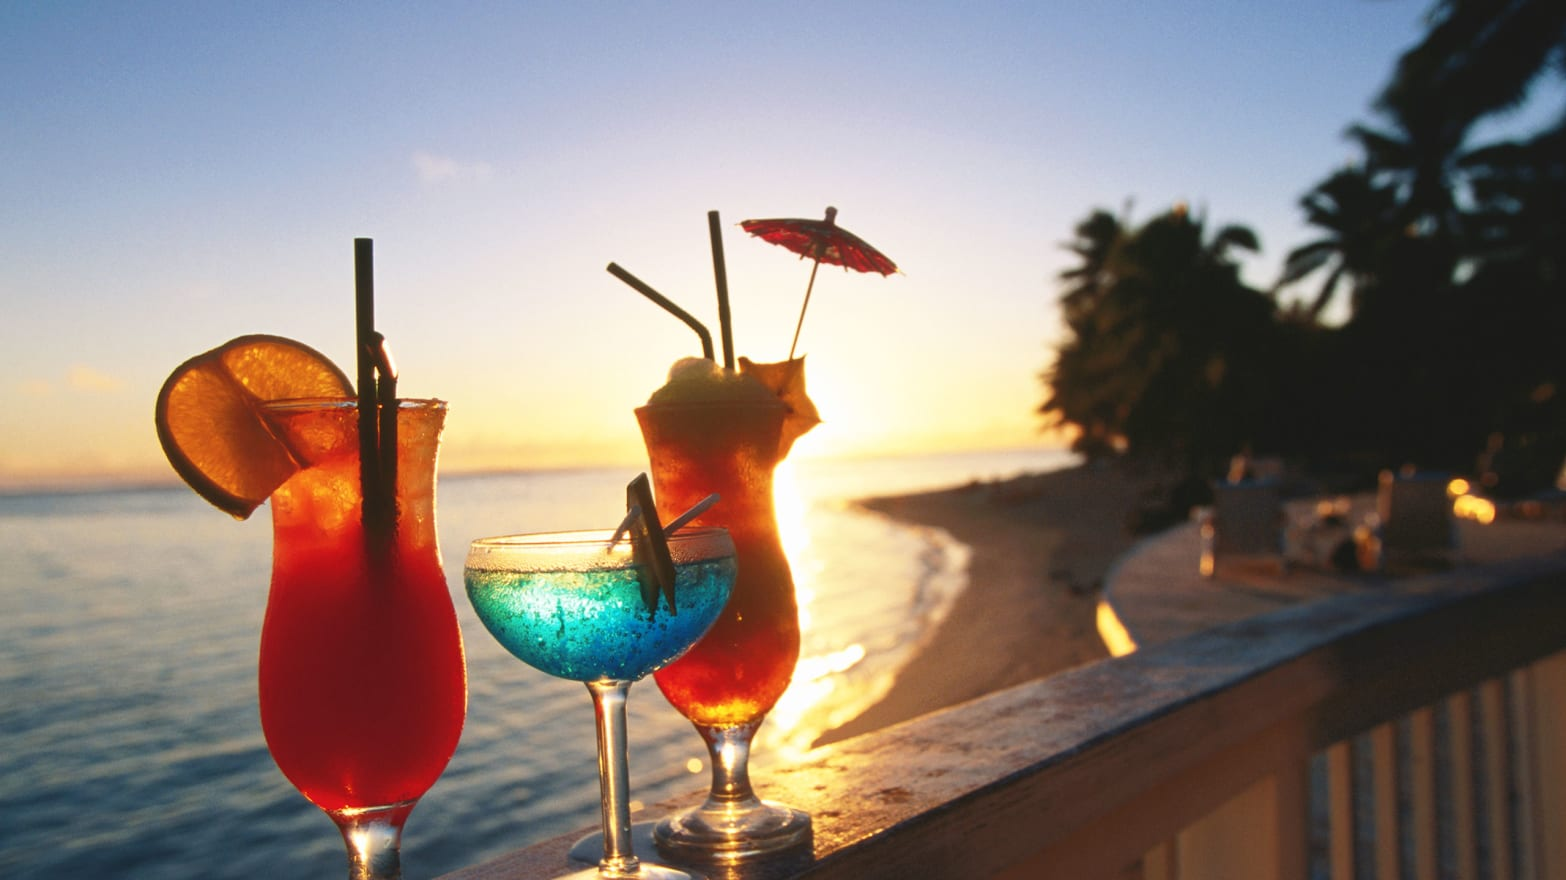 Beach Resort tails Suck. Let's Make Them Brilliant on